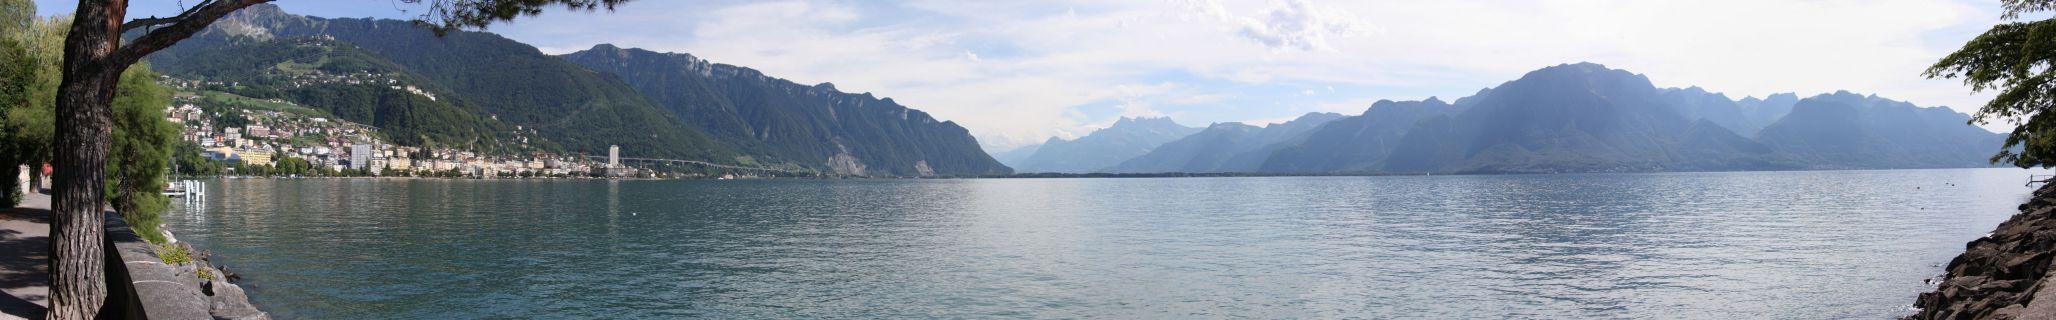 Montreux-Panorama von Clarens aus